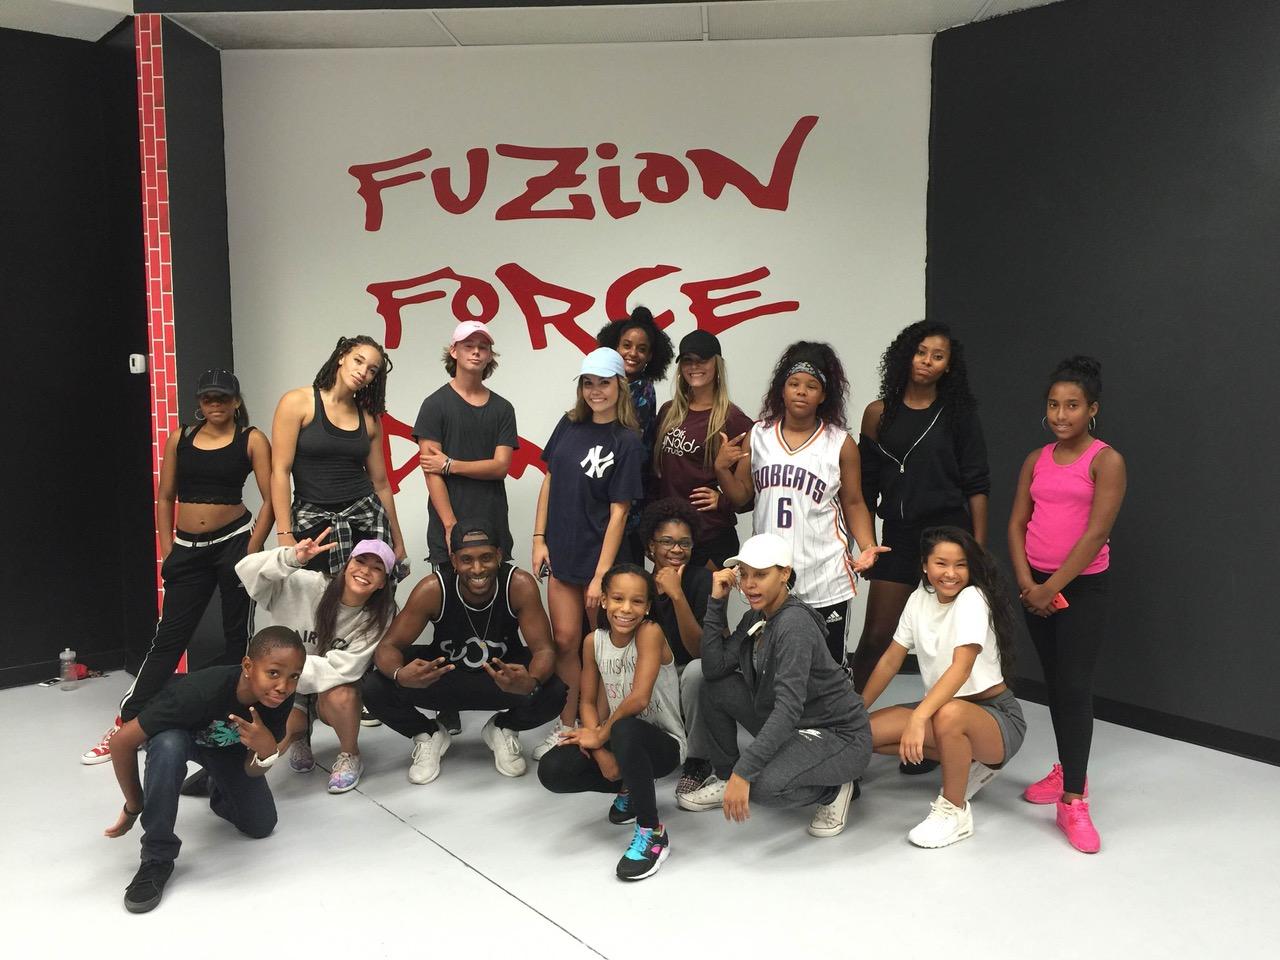 Fuzion Force Dancers